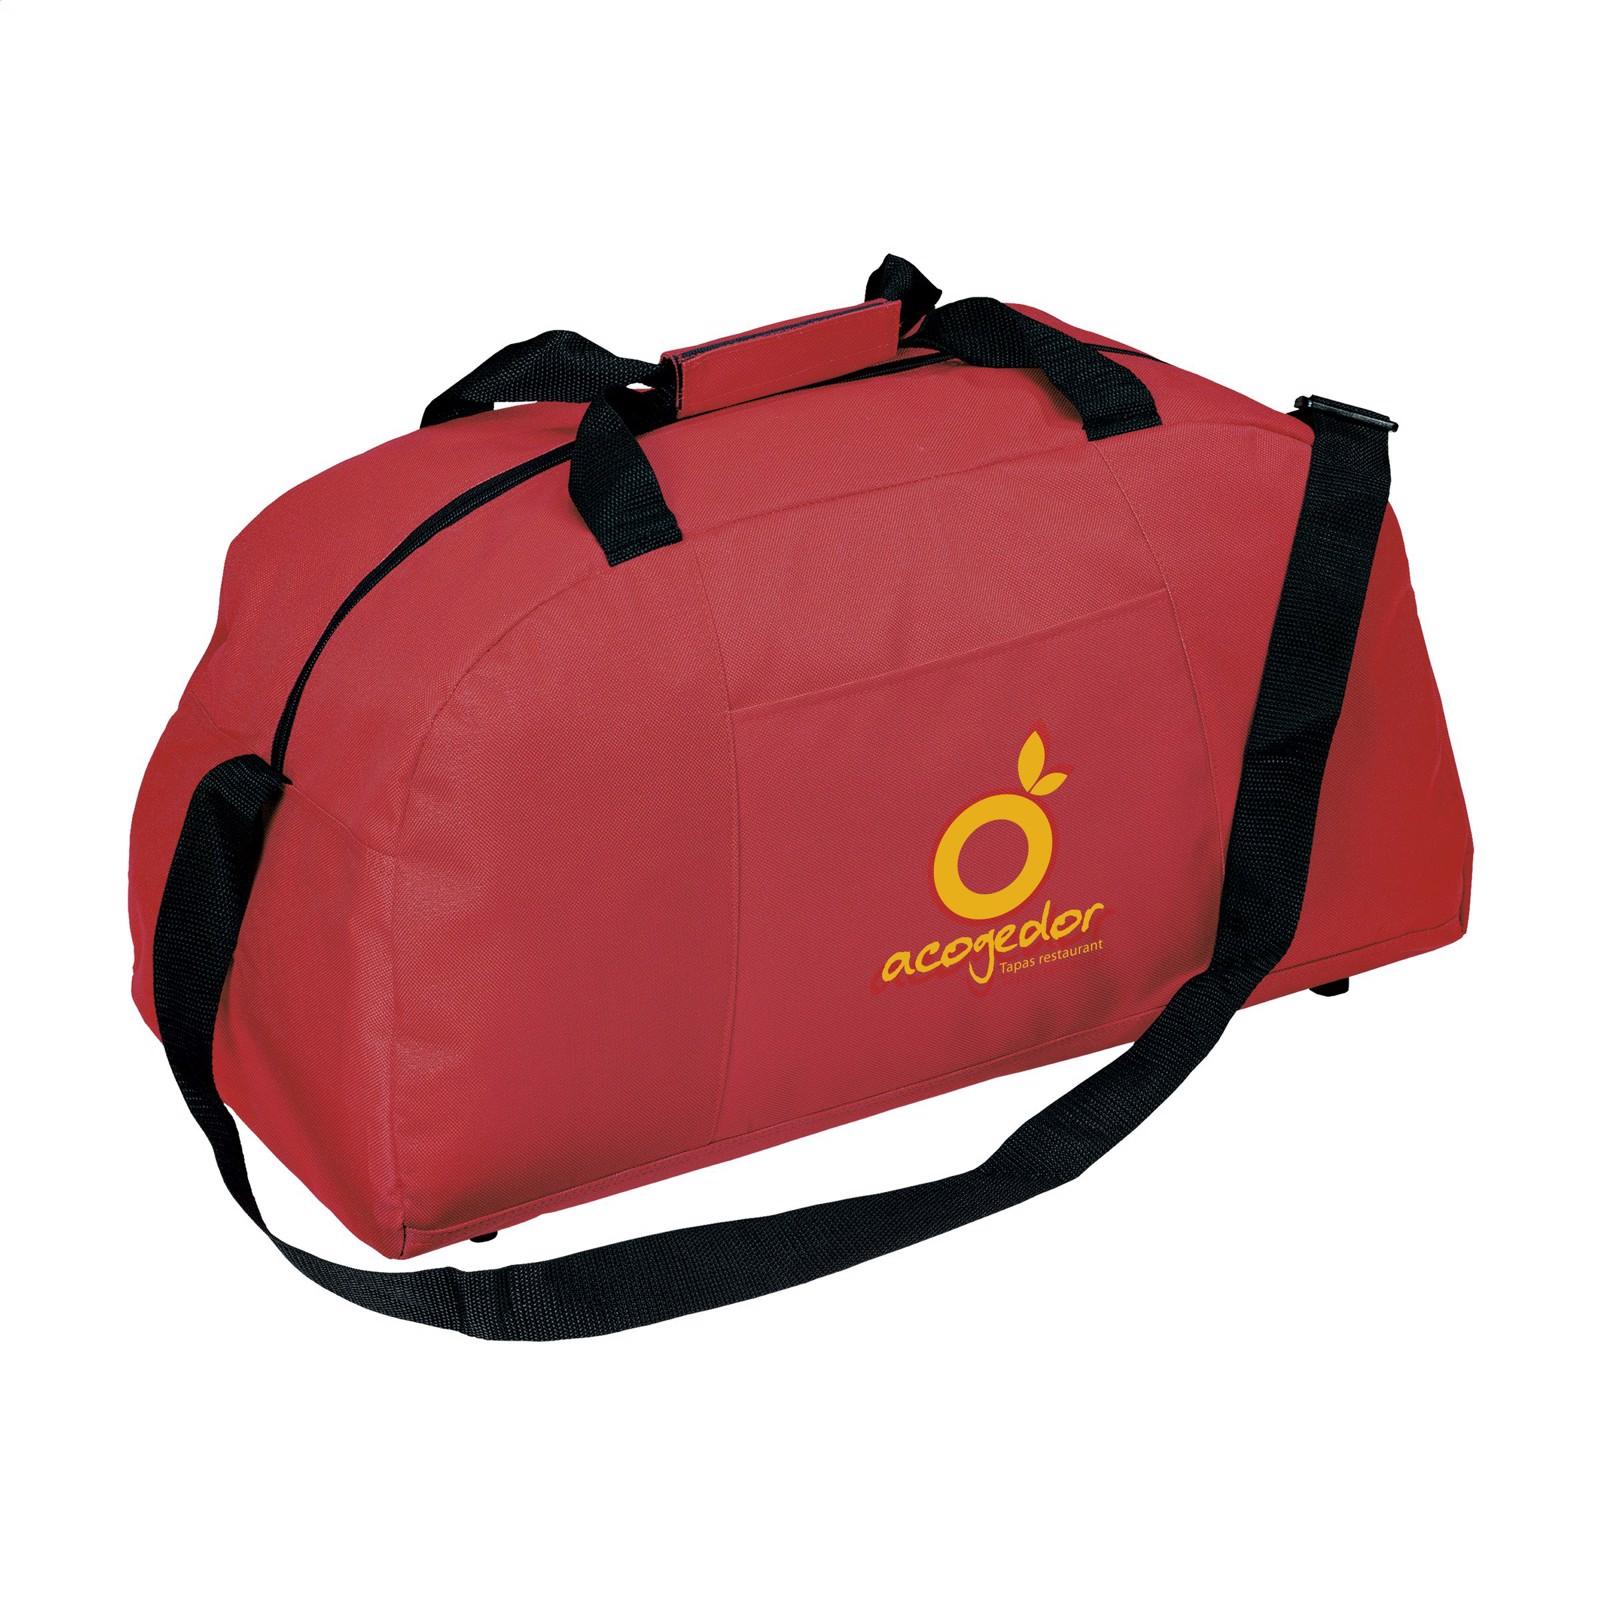 TrendBag sports/travel bag - Red